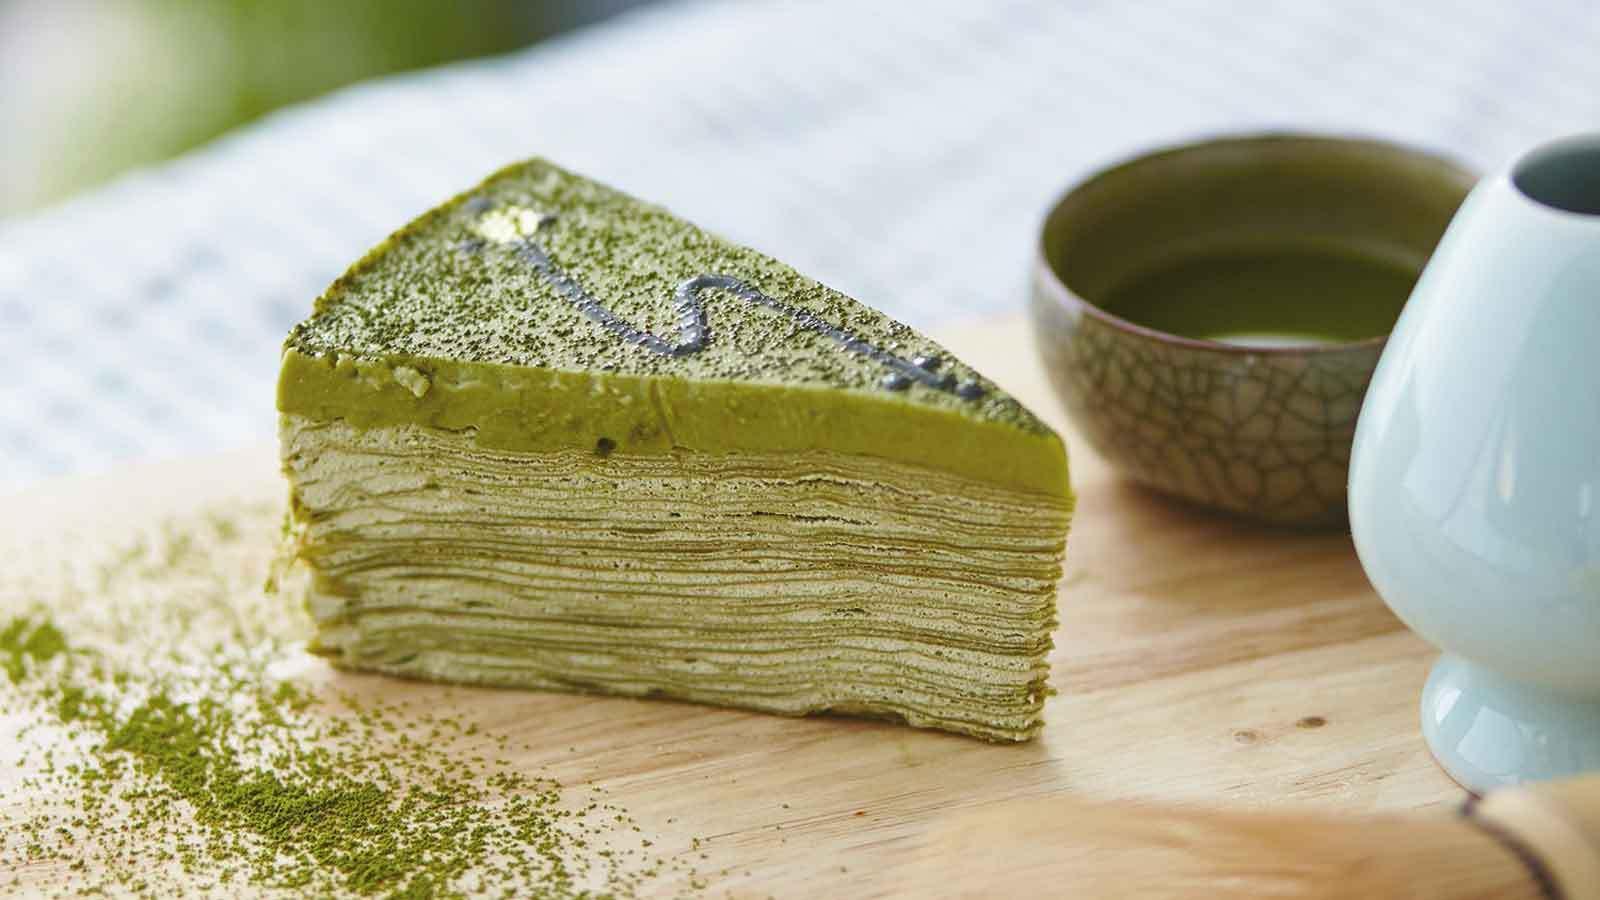 matcha green tea baked into a cake